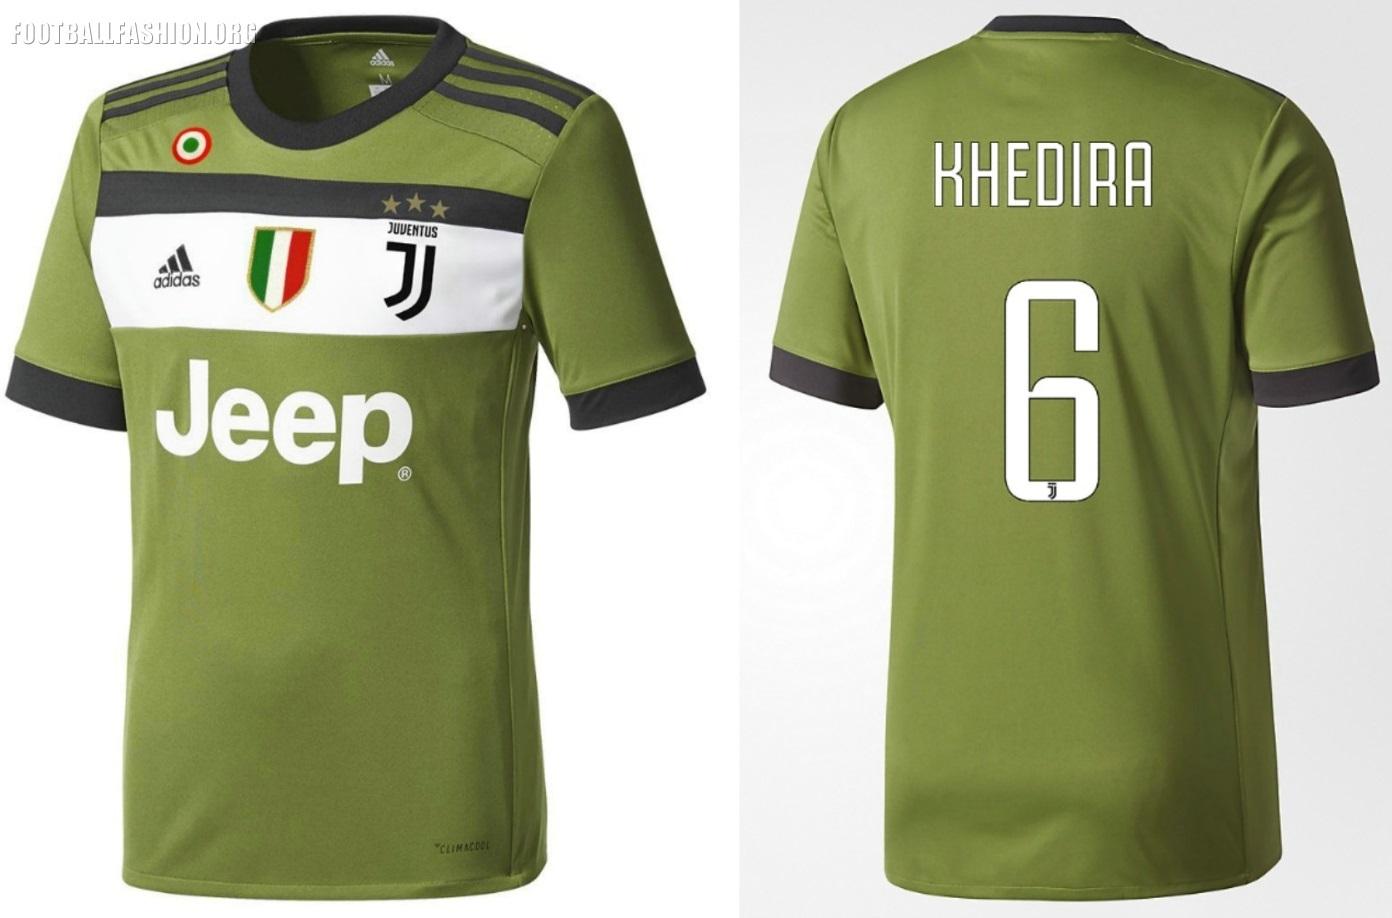 pretty nice 5bdea cbec0 Juventus FC 2017/18 adidas Third Kit - FOOTBALL FASHION.ORG